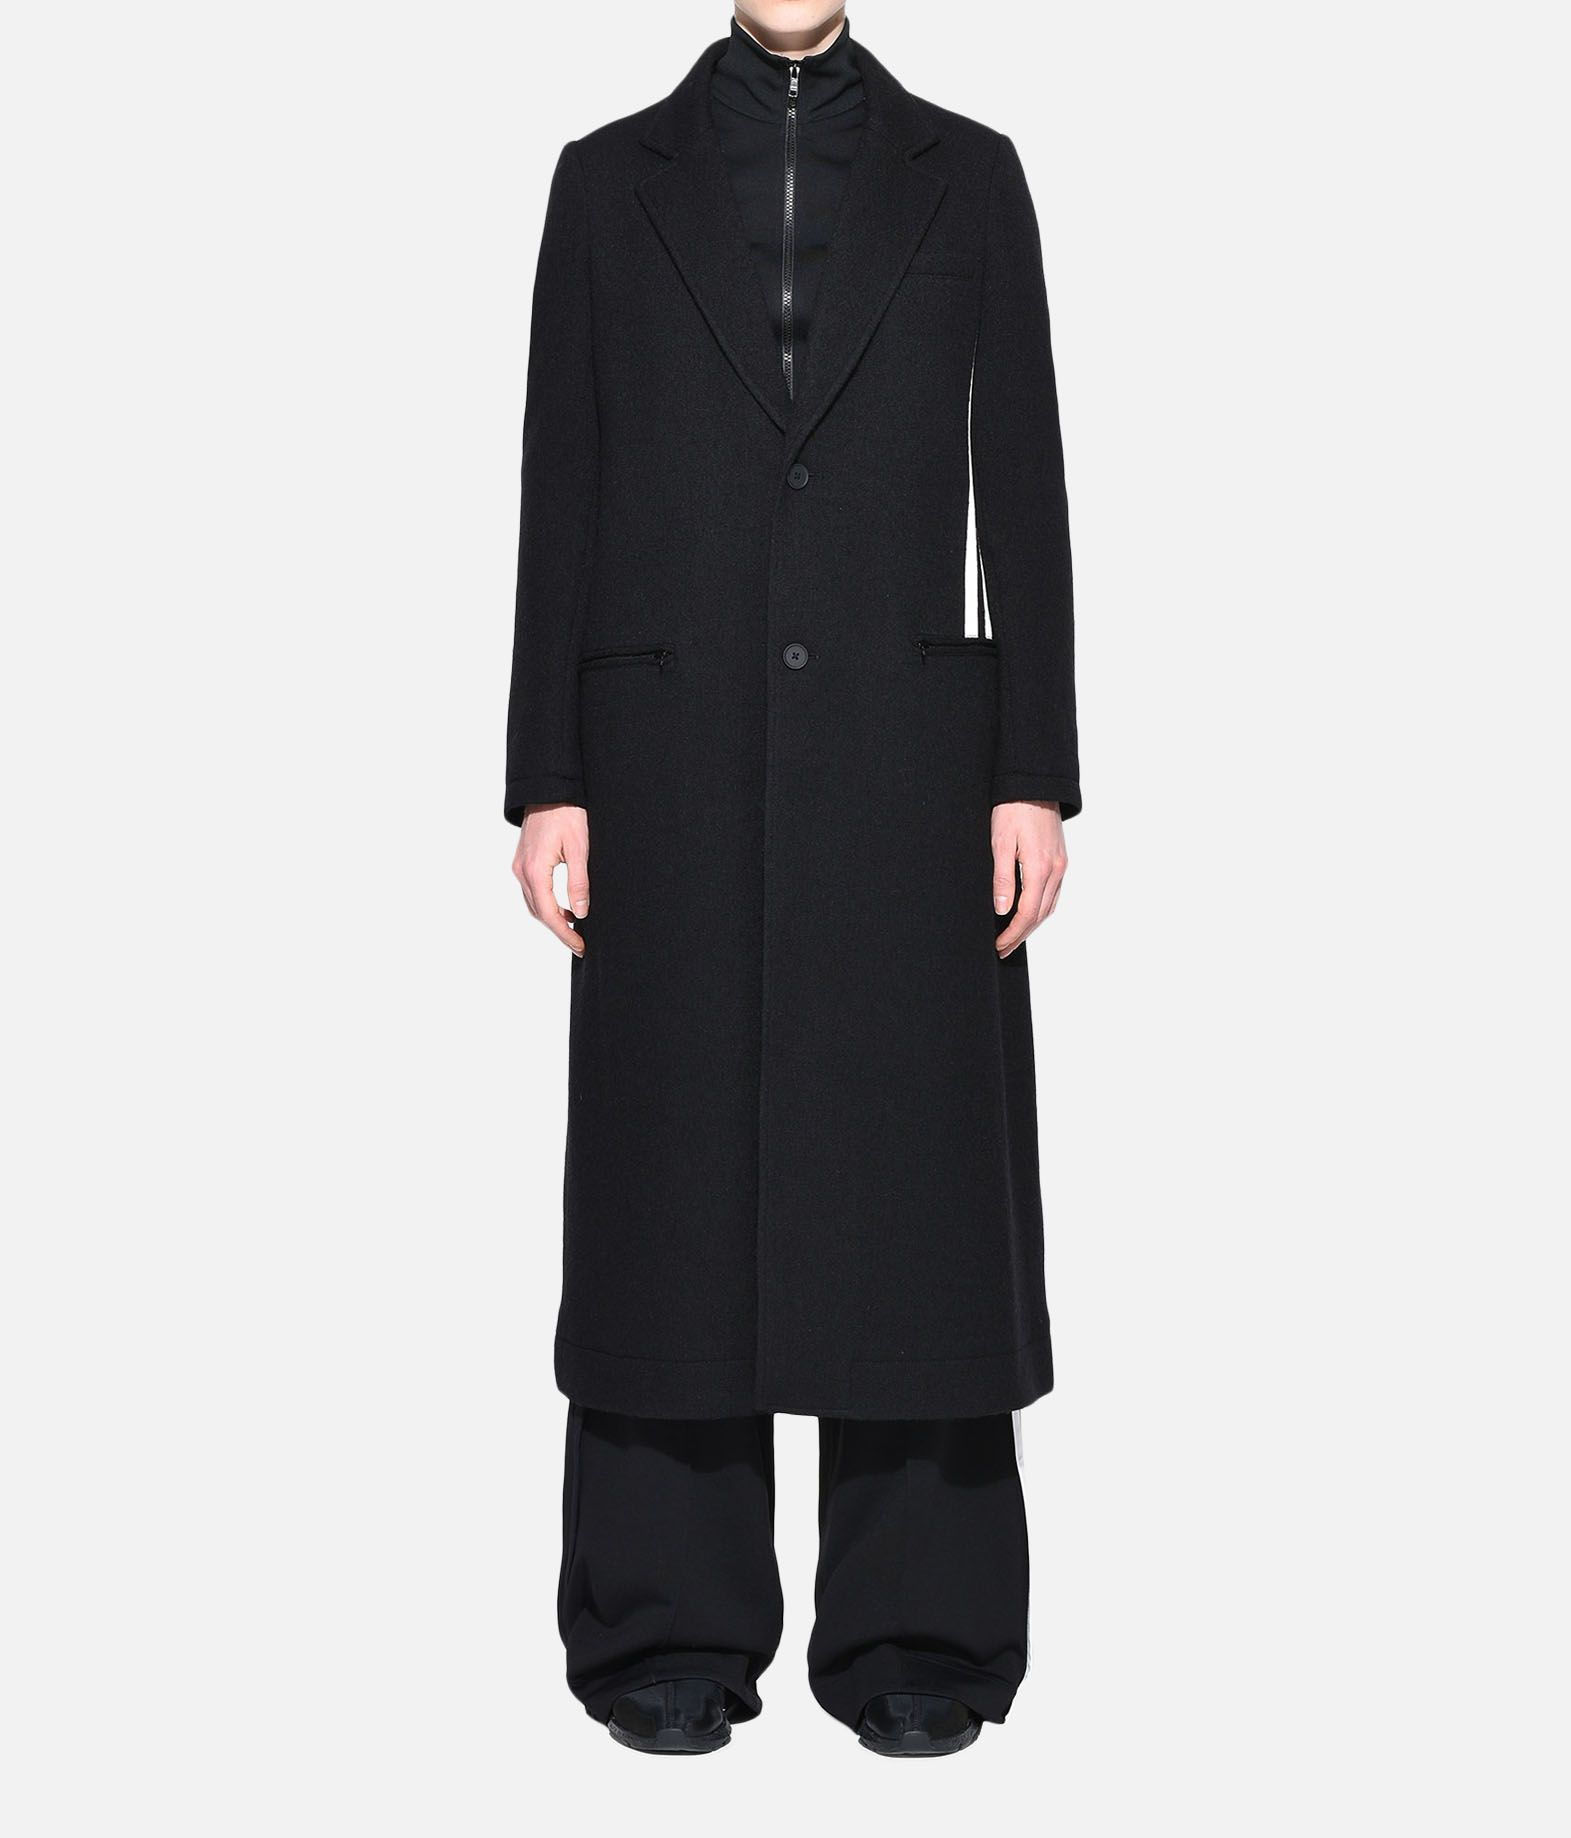 Y-3 Y-3 3-Stripes Tailored Wool Coat Blazer Damen r